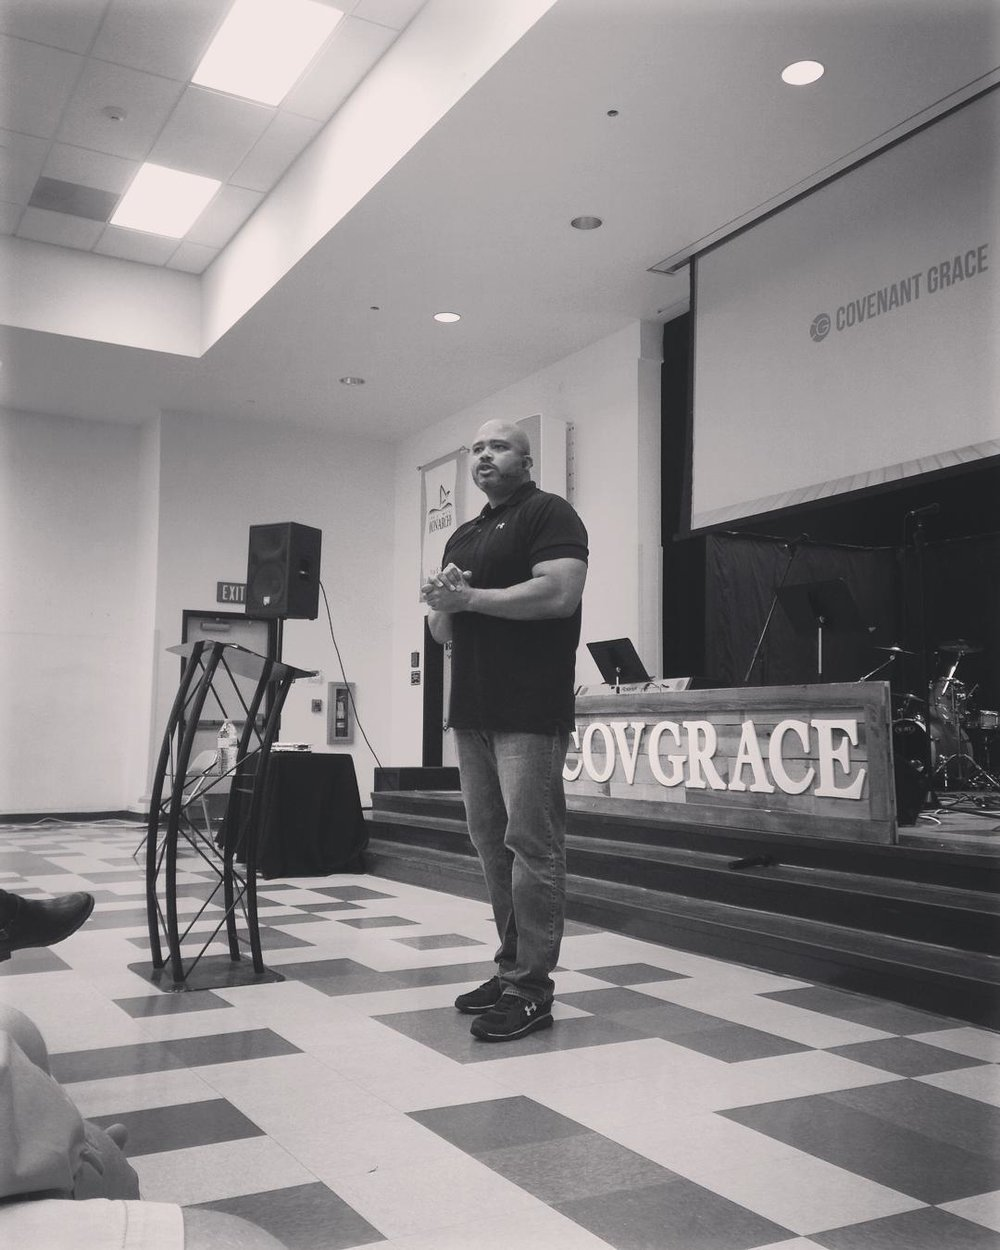 Sabo Cortez, Lead Pastor